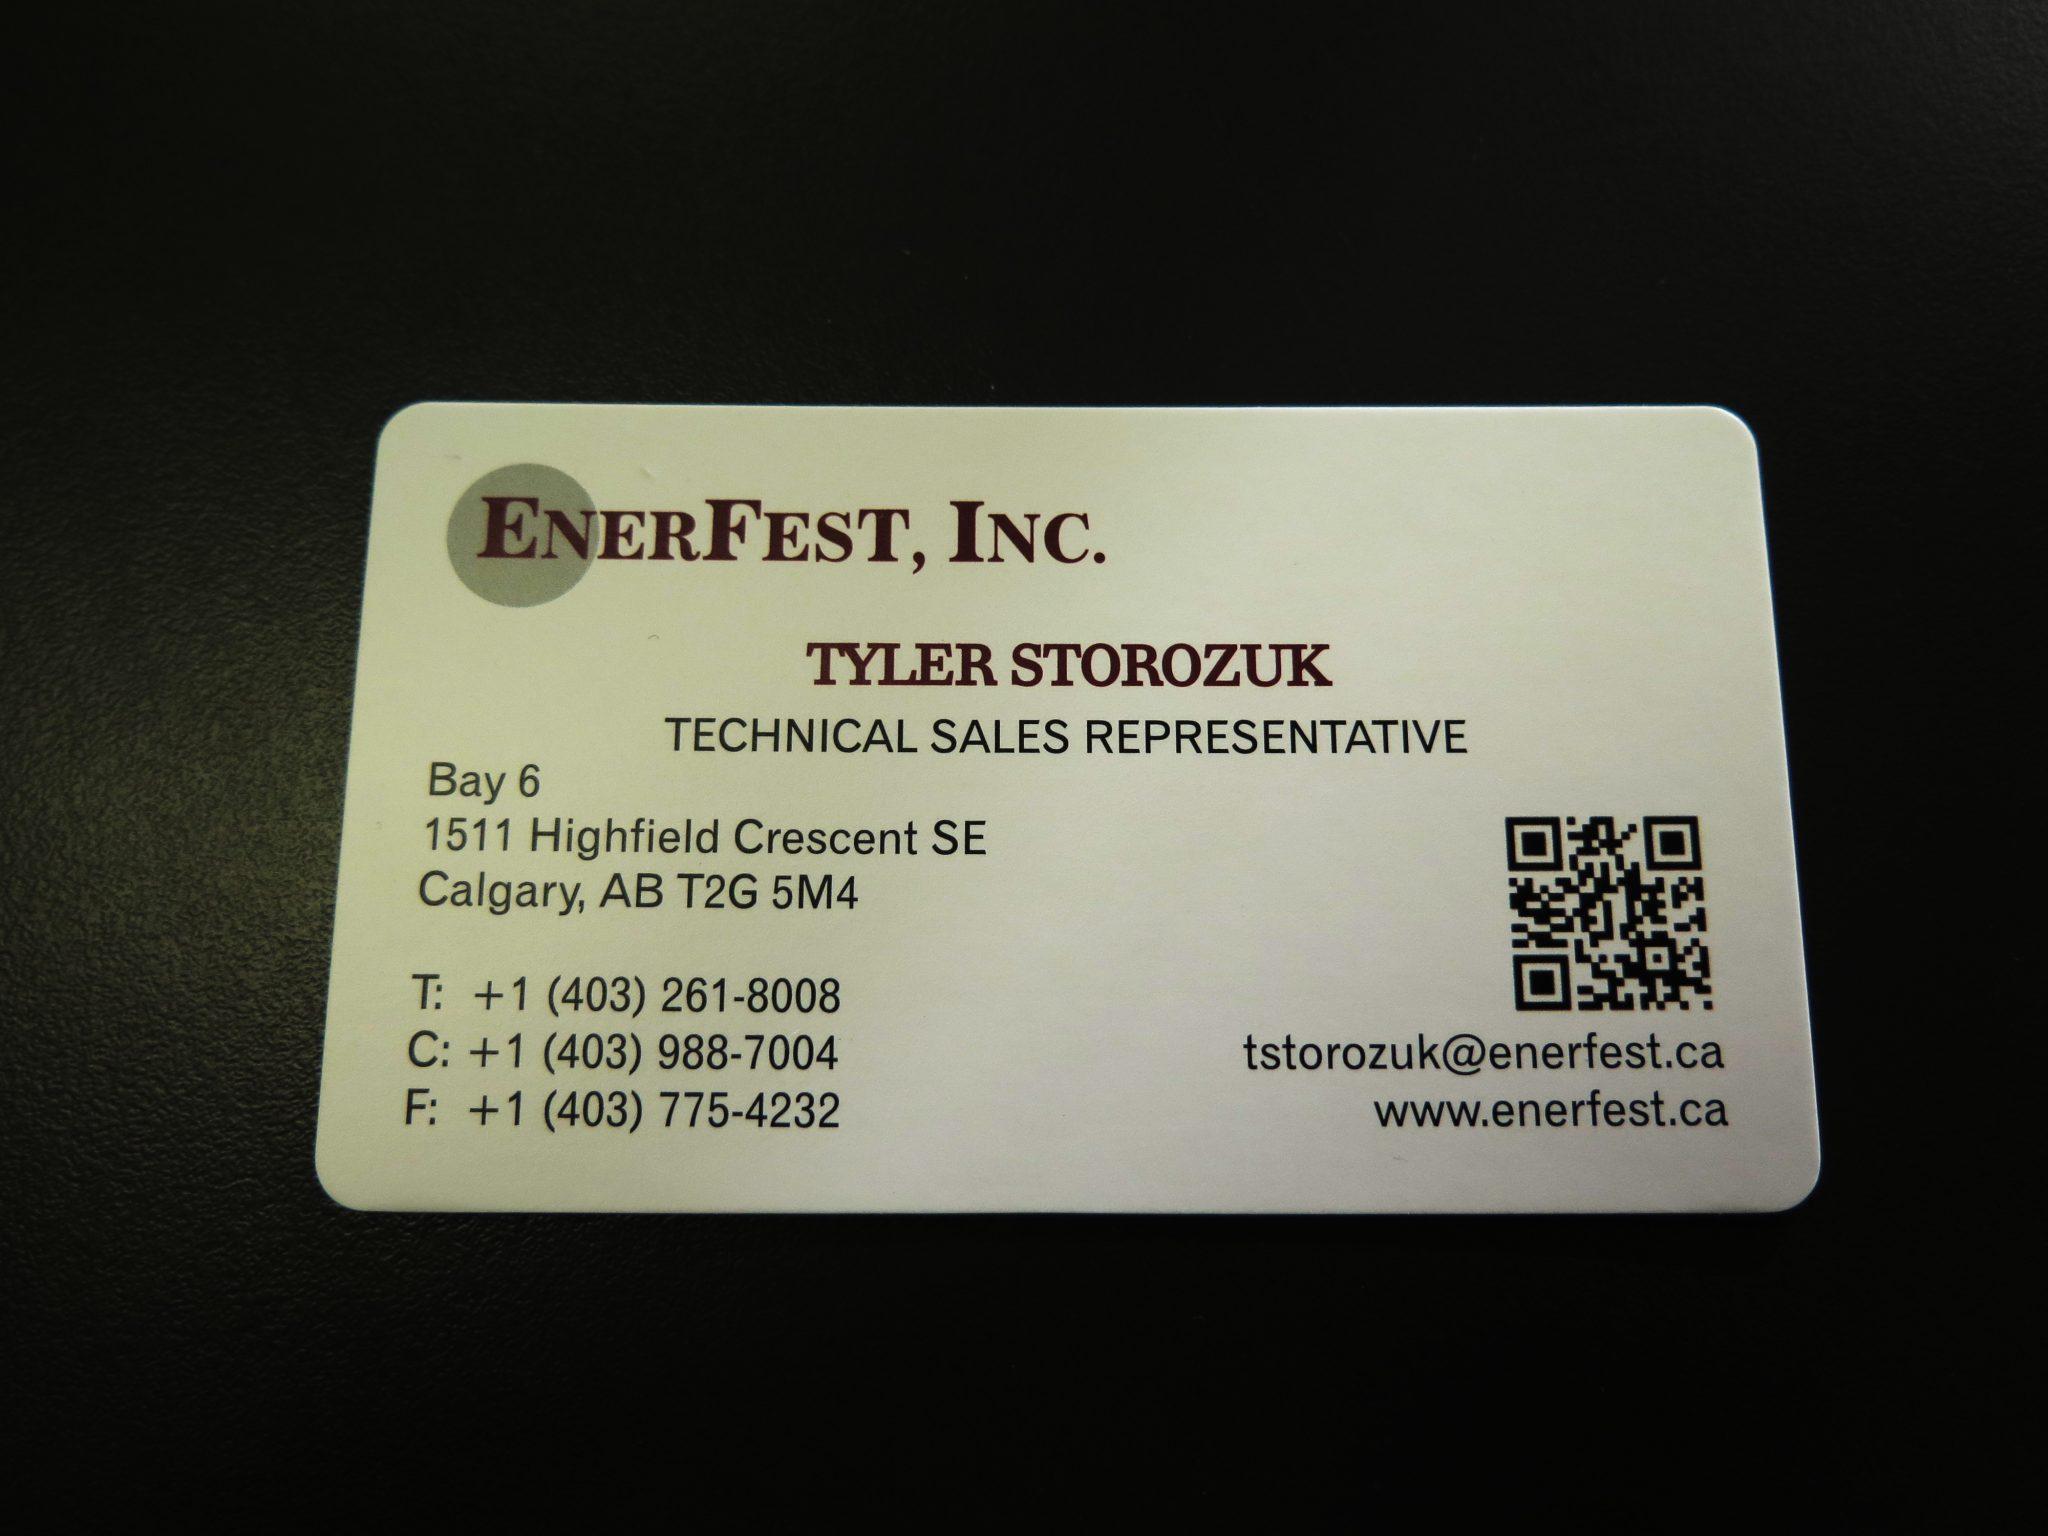 Digital Business Cards At Minuteman Press Beltine Quick